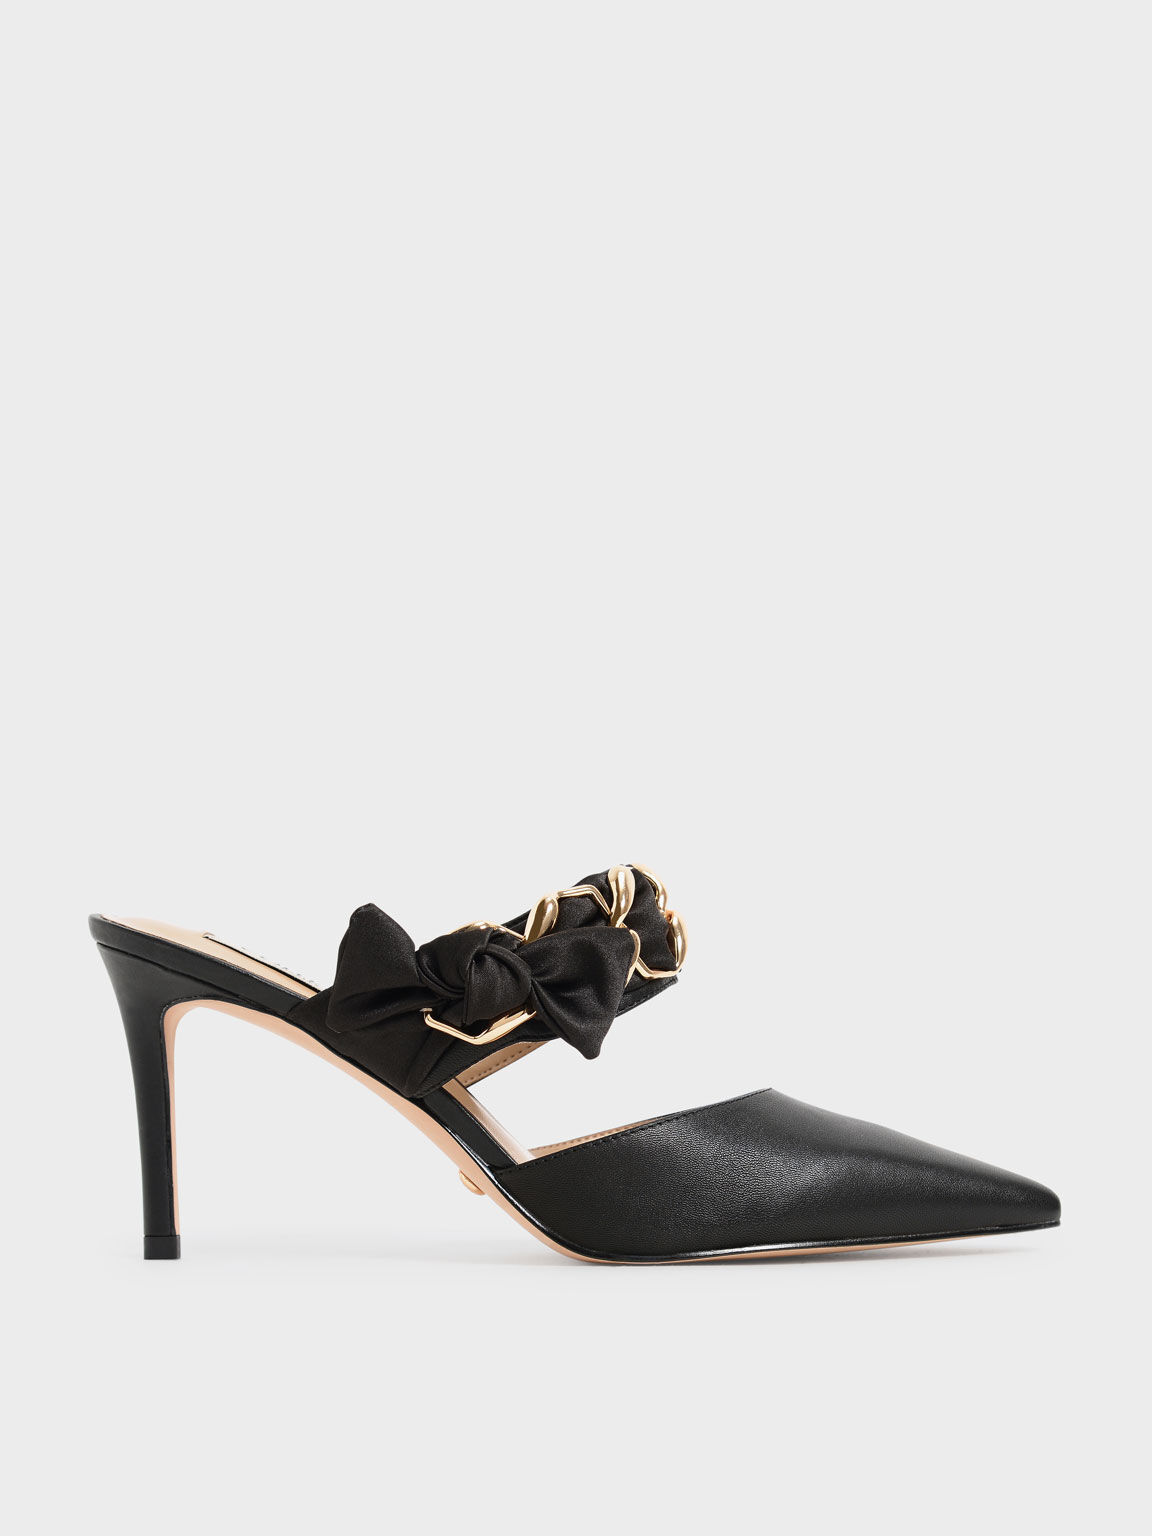 Satin Bow Leather Mules, Black, hi-res